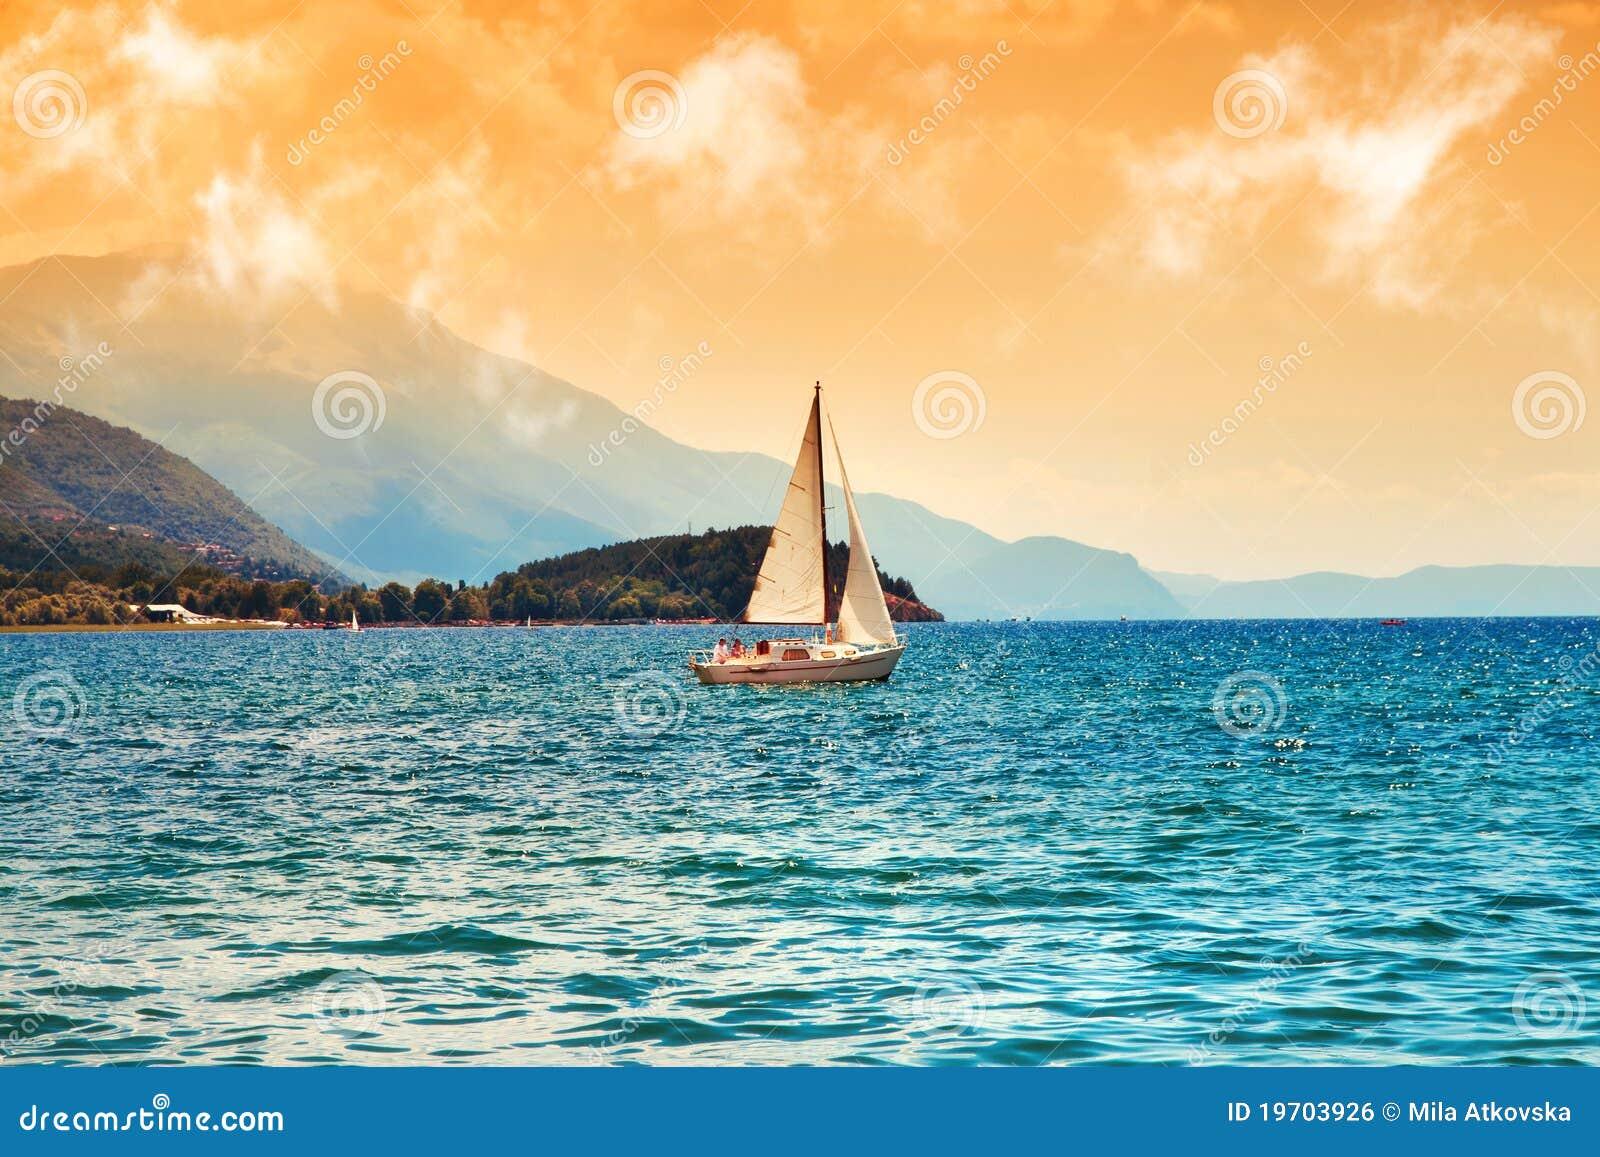 Surreal image of Ohrid Lake